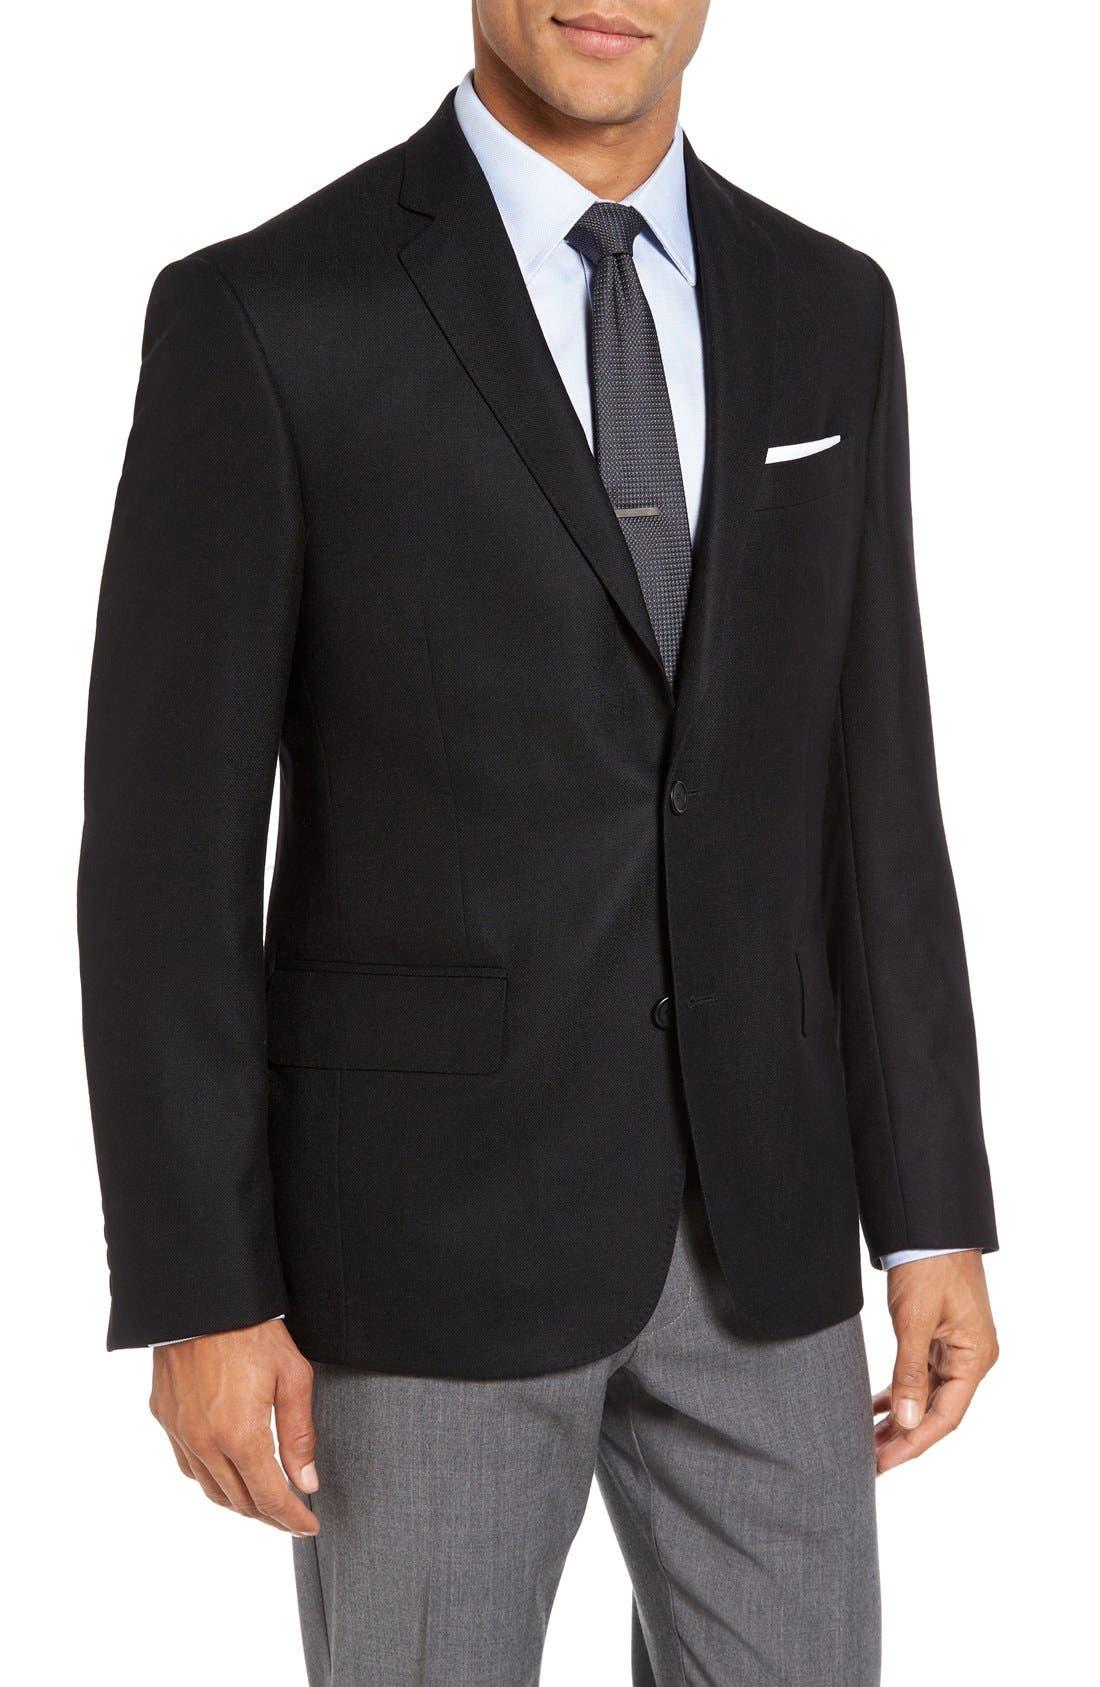 Classic Fit Wool & Cashmere Blazer,                             Main thumbnail 1, color,                             001